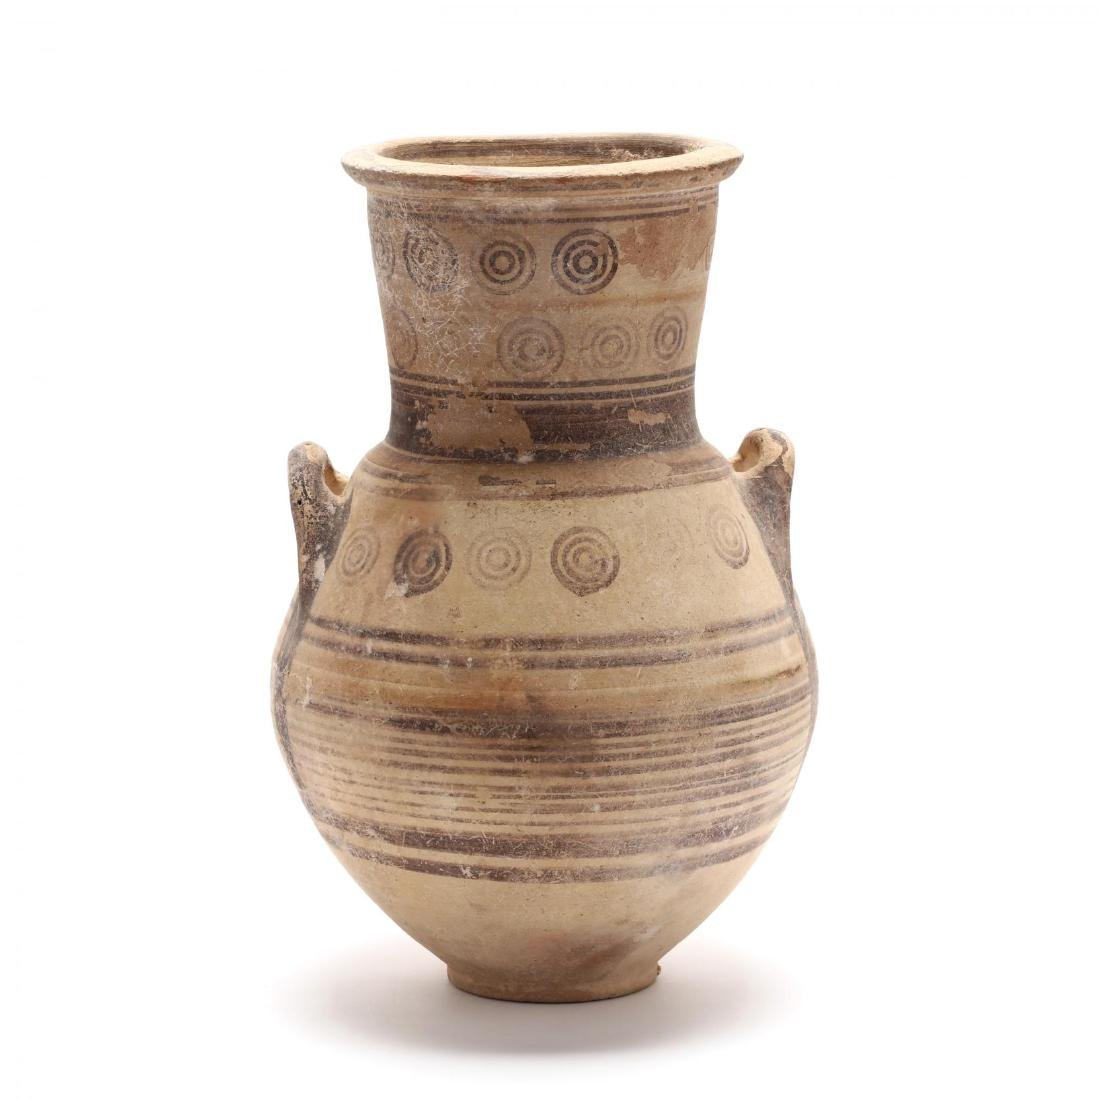 Cypro-Archaic Bichrome Amphora